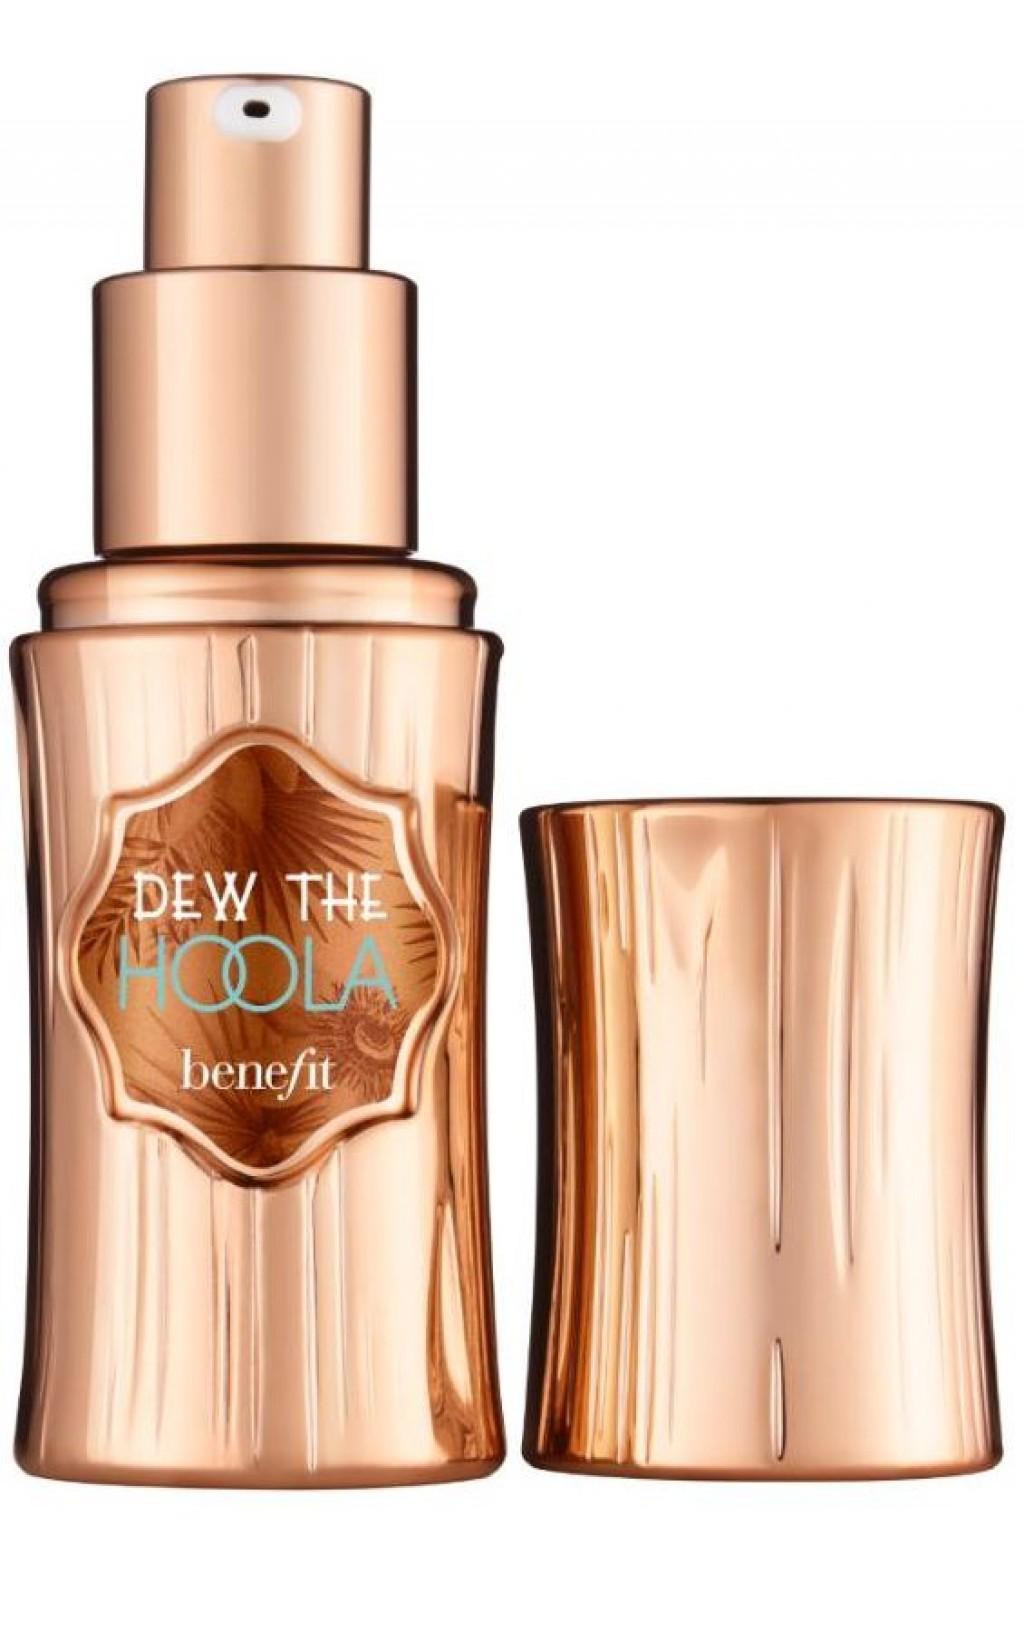 Benefit Dew Hoola Soft-Matte Liquid Bronzer For Face